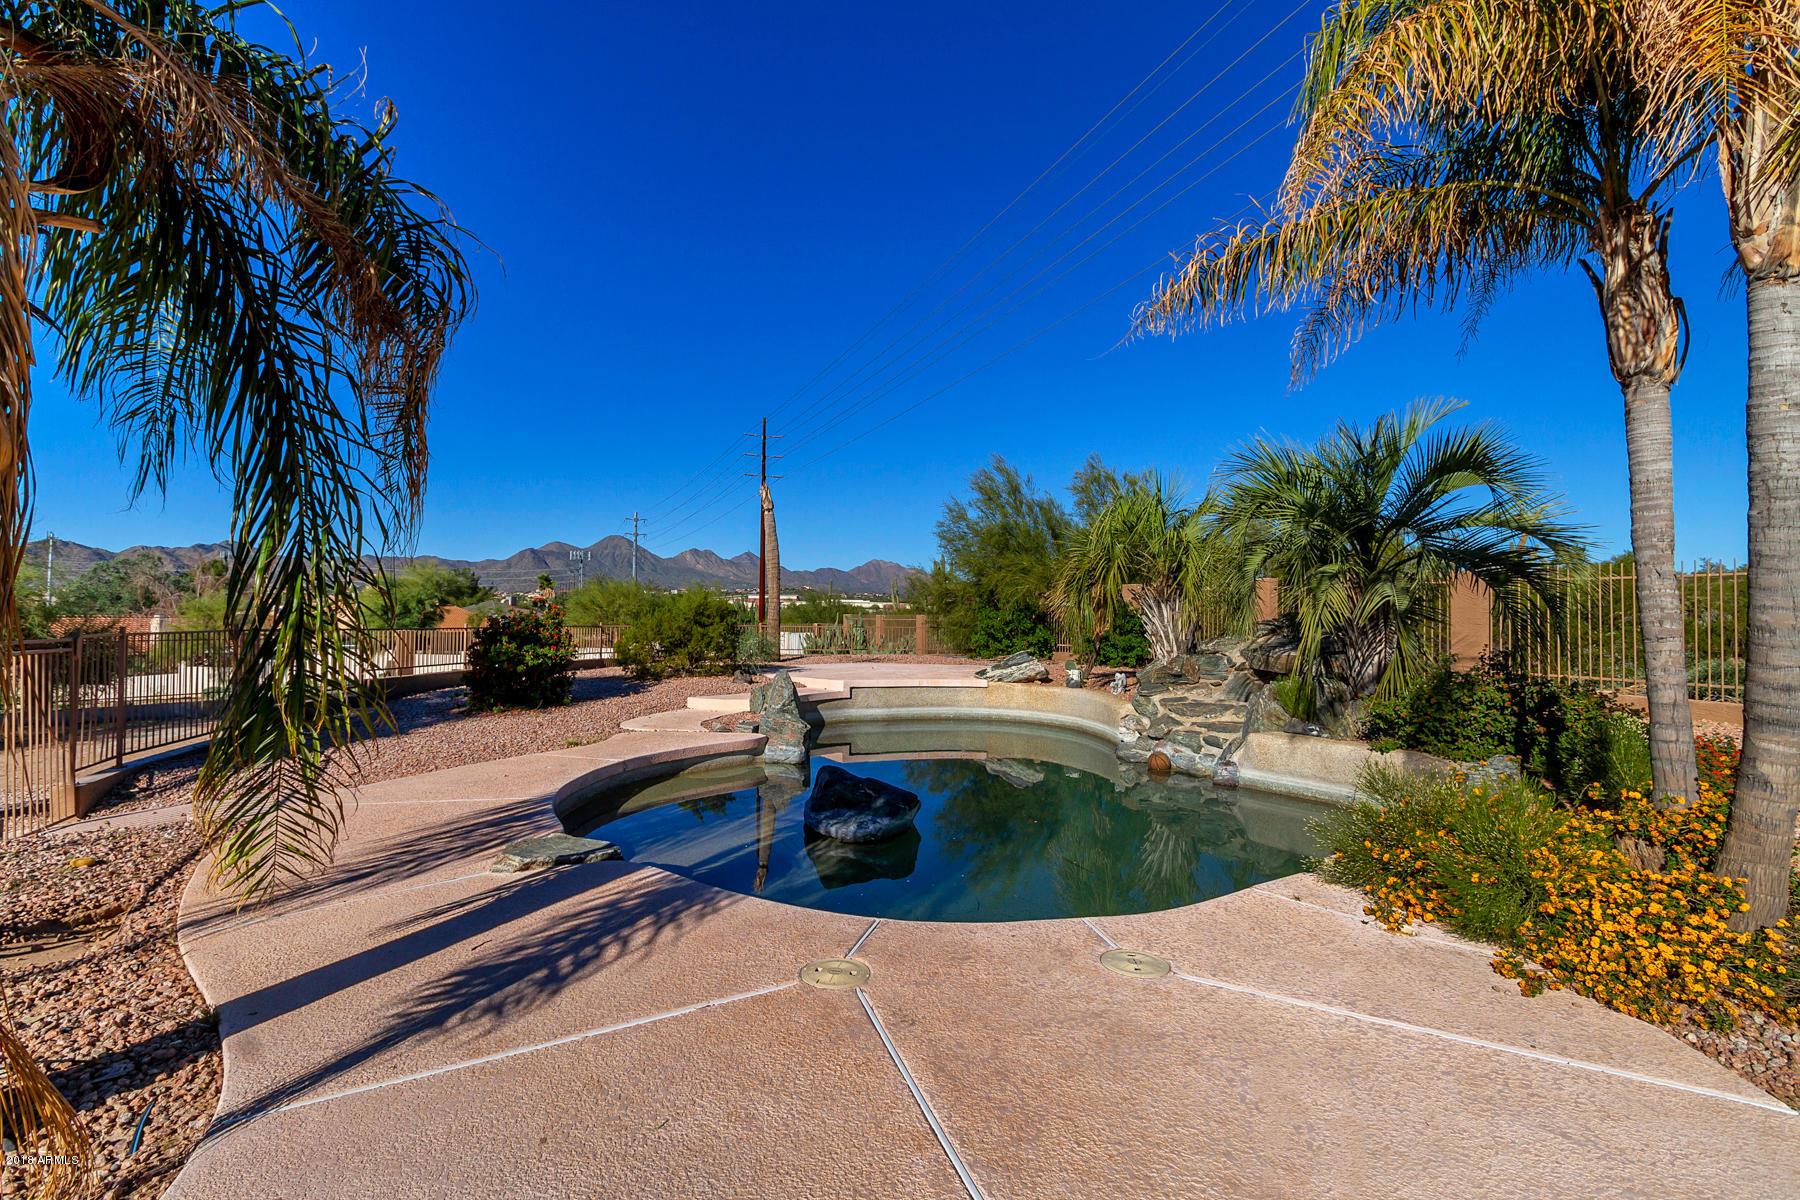 MLS 5846857 16916 E CASCADE Drive, Fountain Hills, AZ 85268 Fountain Hills AZ REO Bank Owned Foreclosure